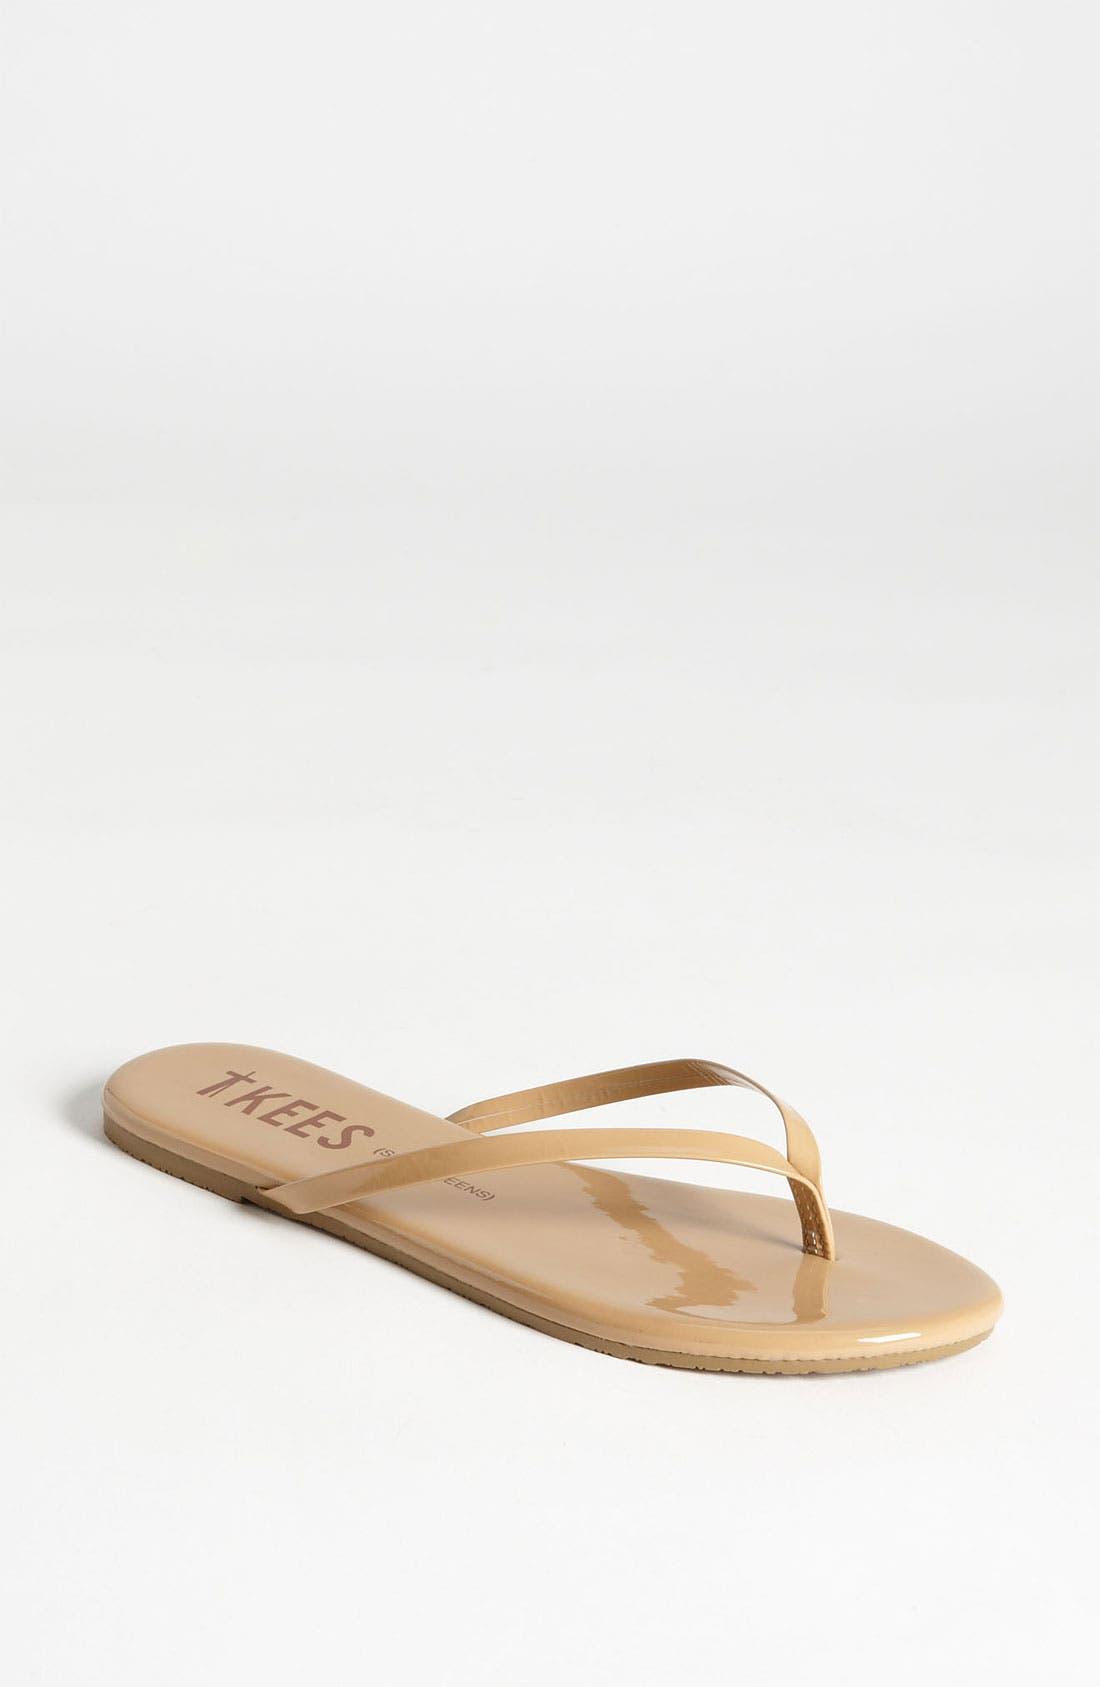 TKEES 'Sunscreens' Flip Flop, Main, color, 250